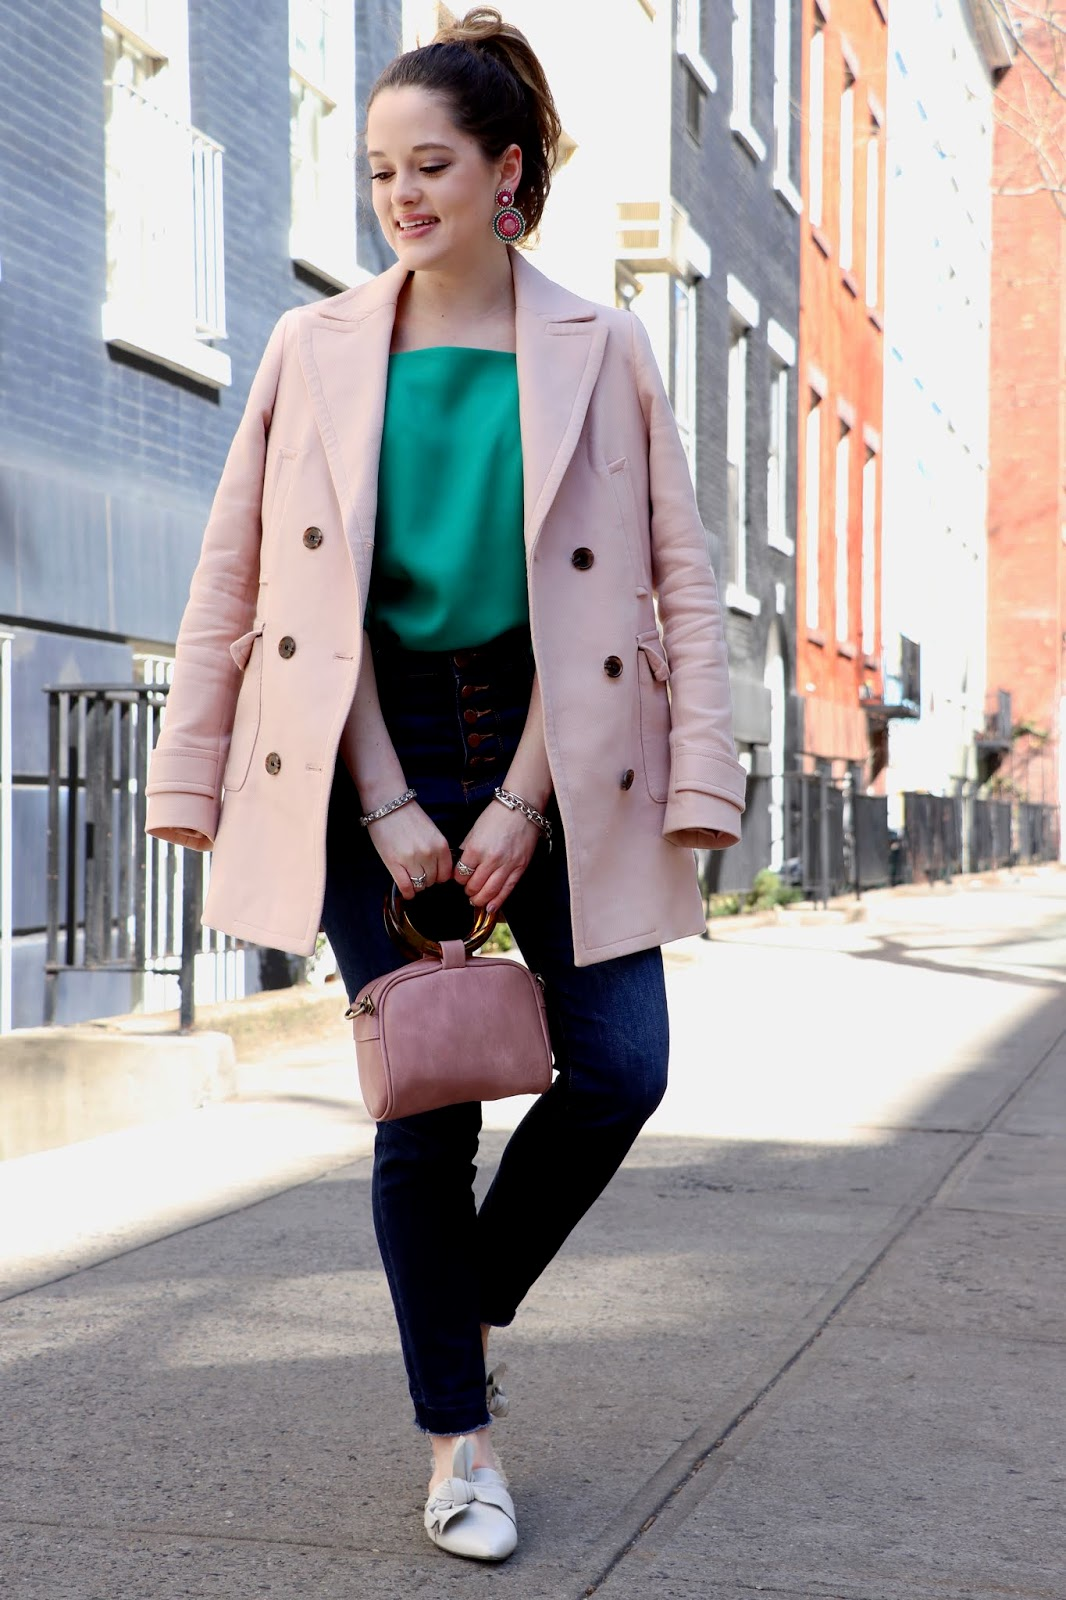 Nyc fashion blogger Kathleen Harper's spring street style in soho